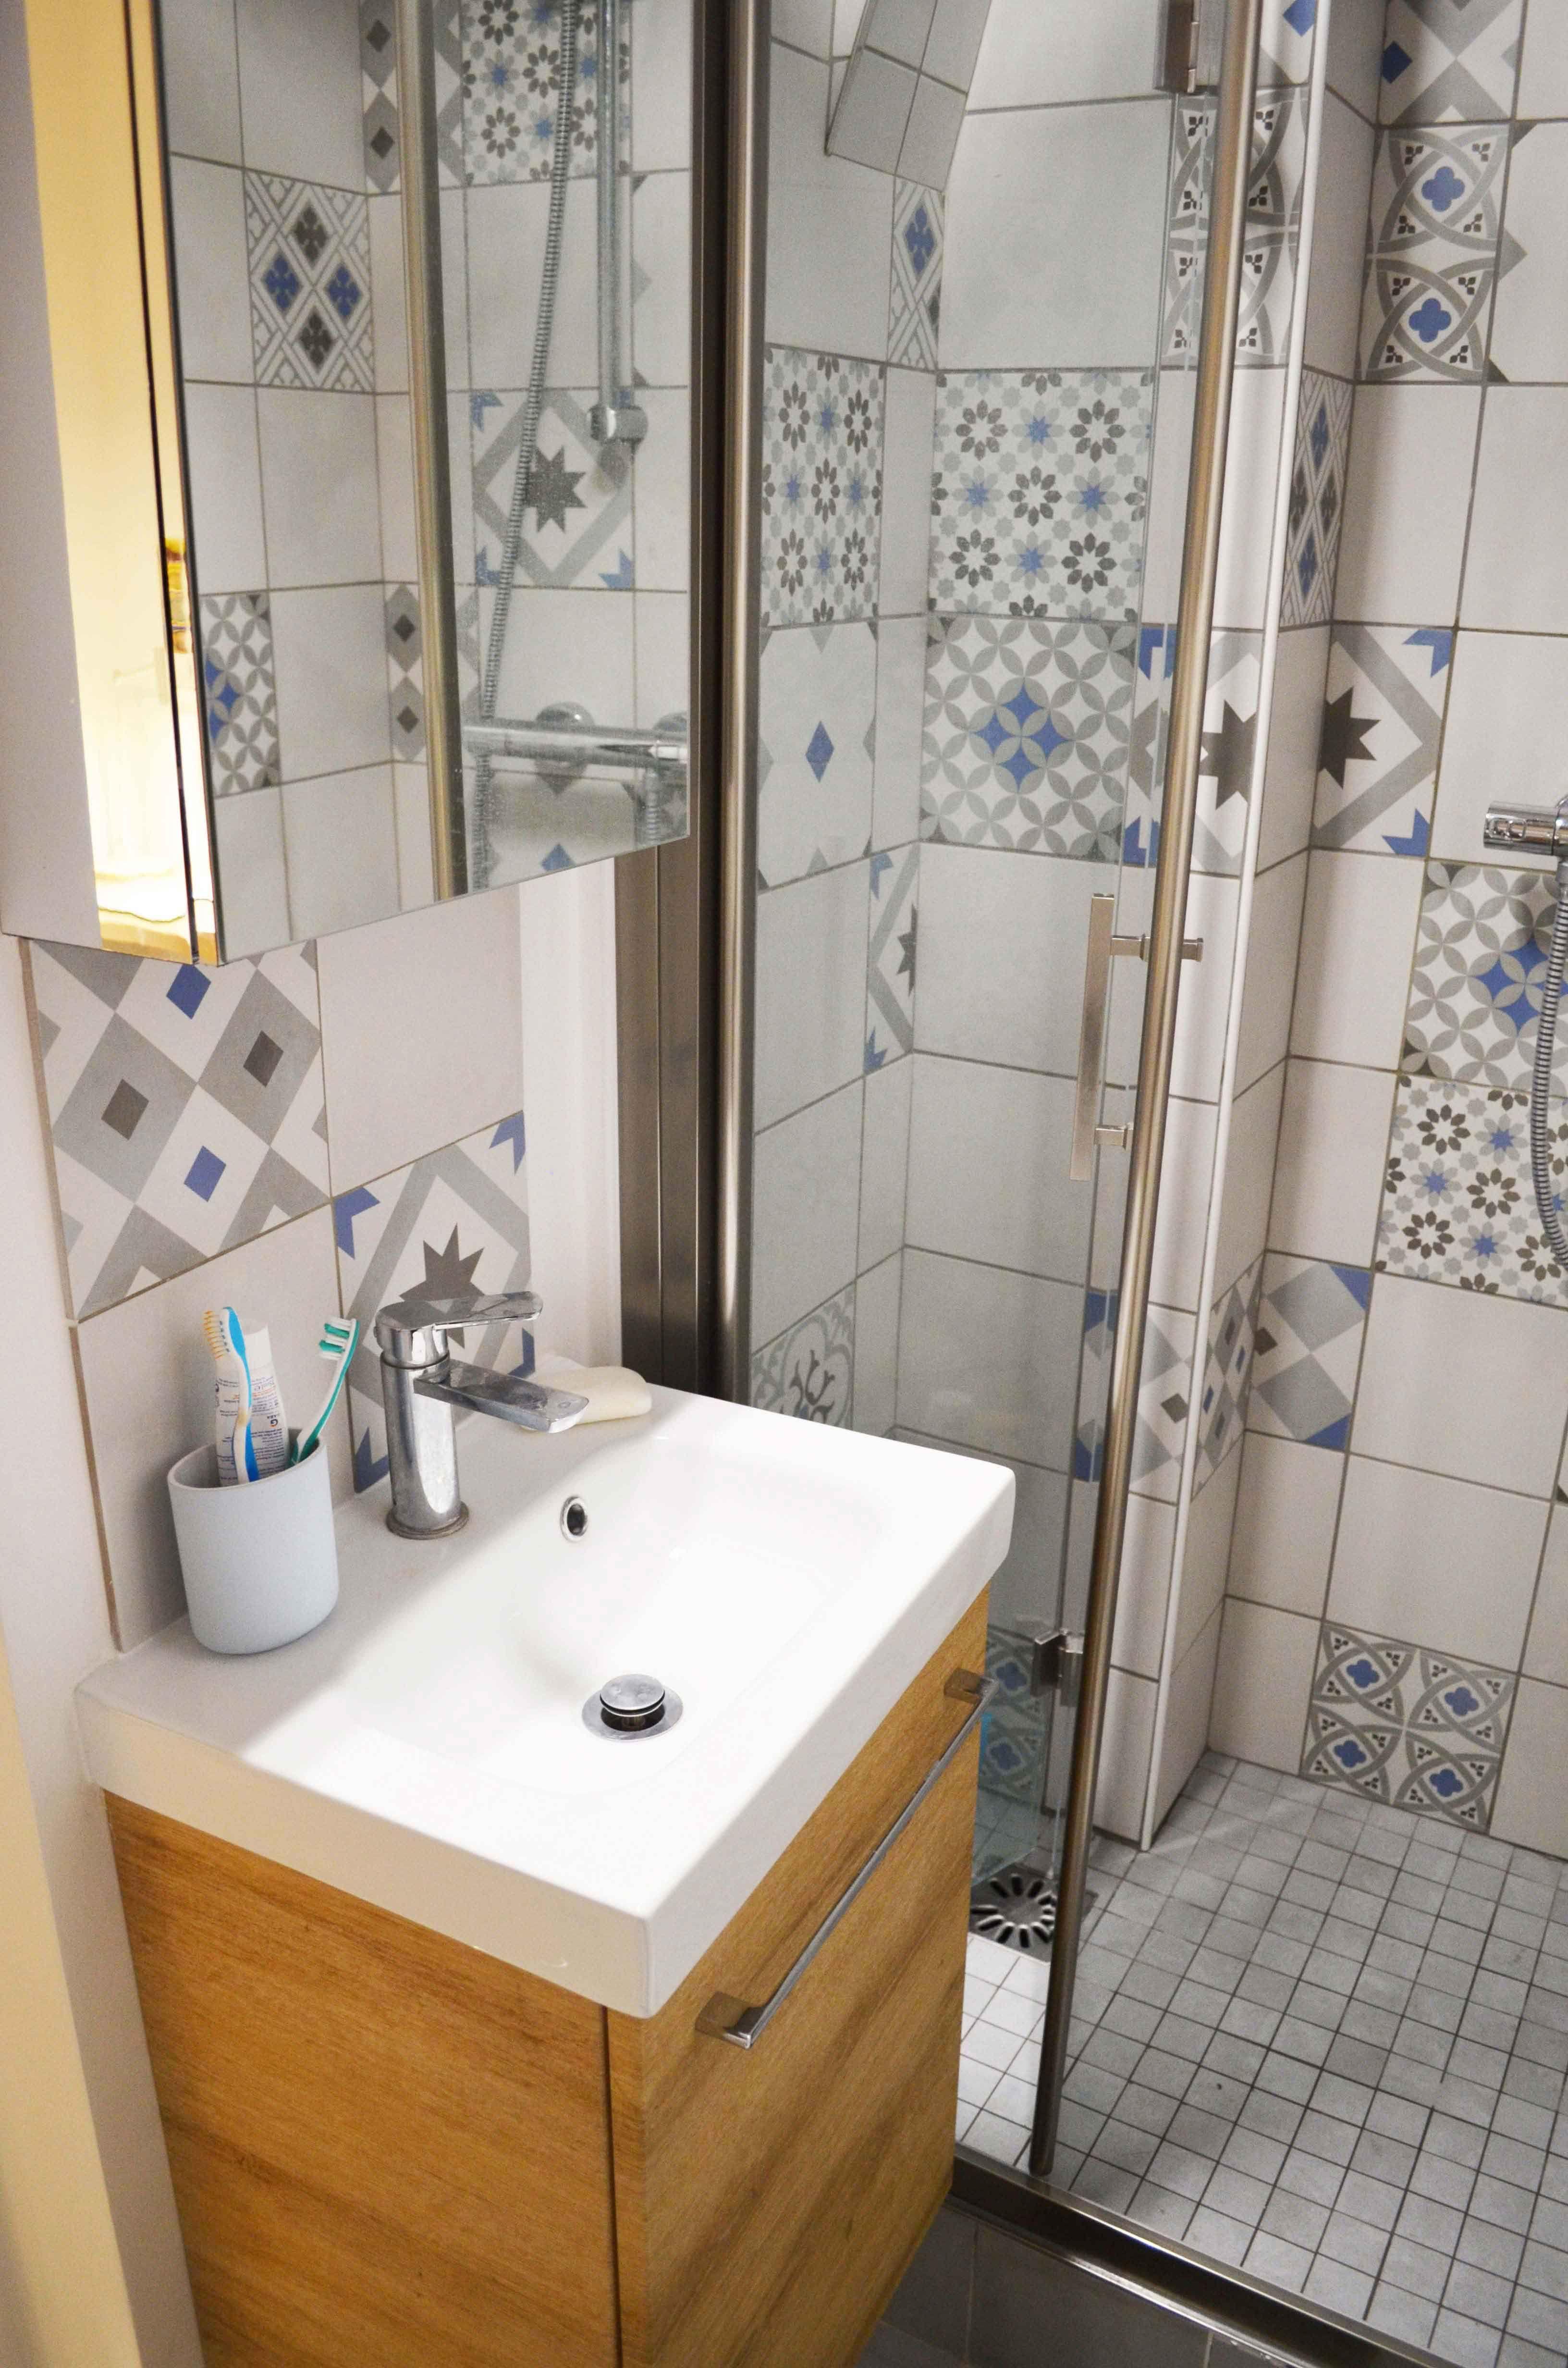 Sandrine carr d coratrice - Armoire a glace salle de bain ...